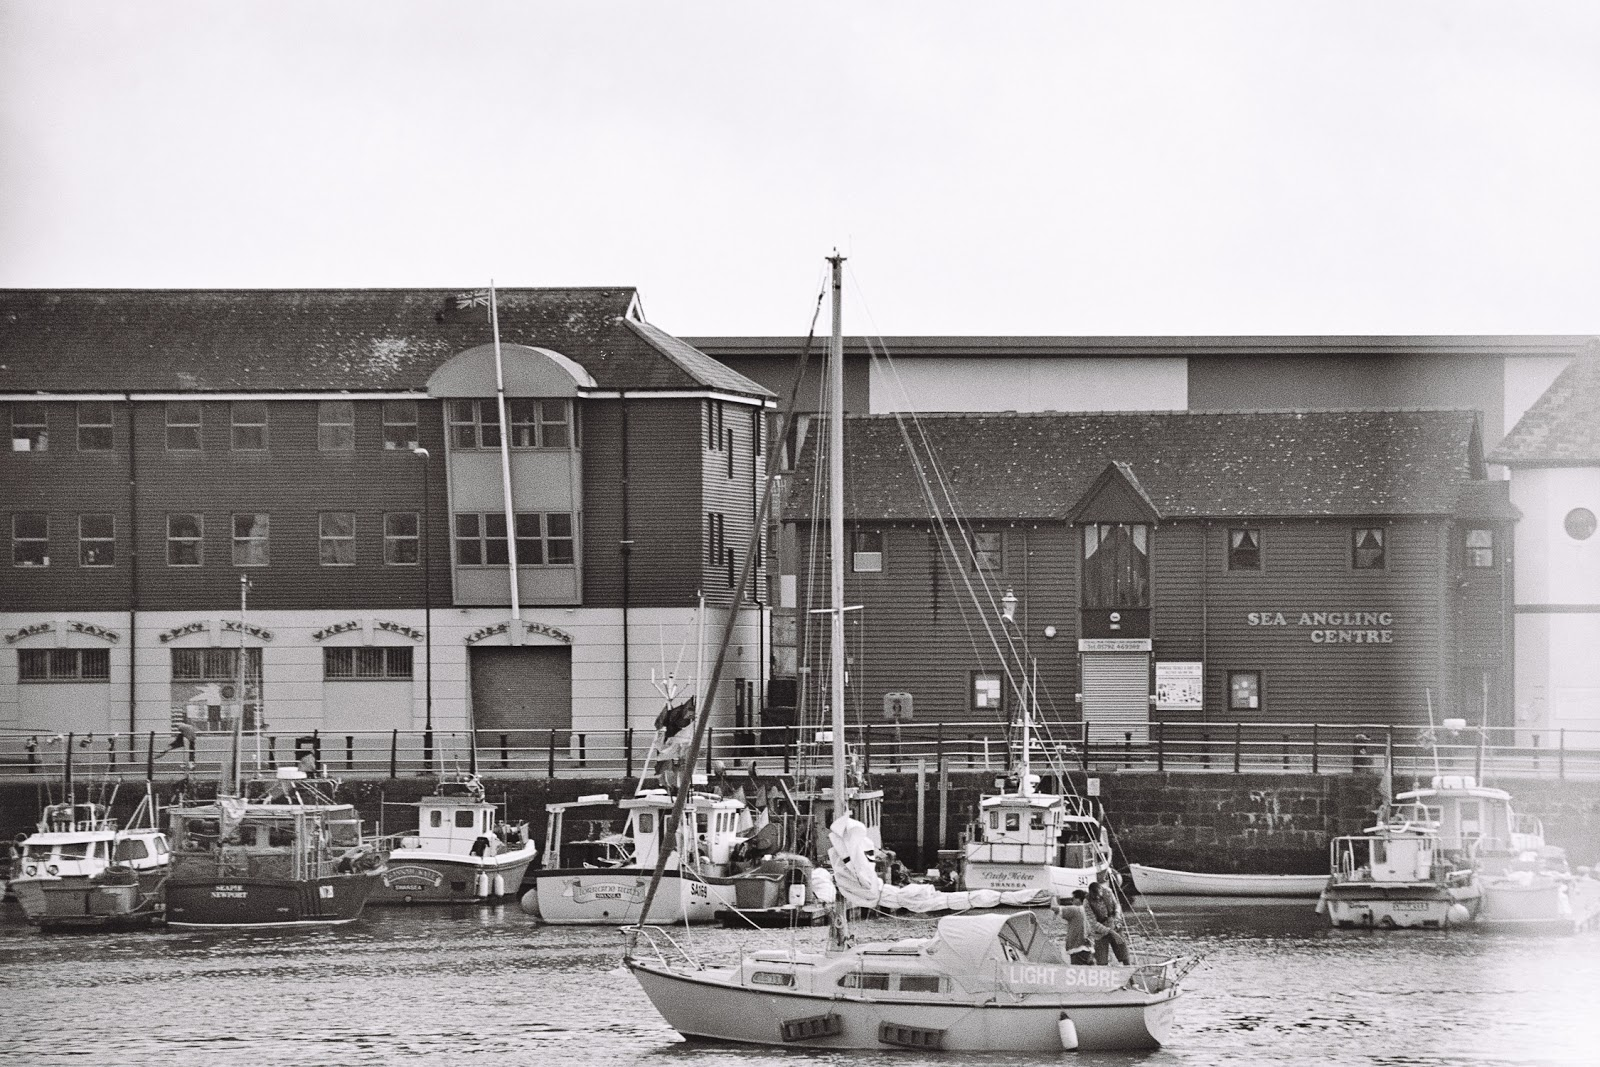 Swansea Marina, Black and white photography